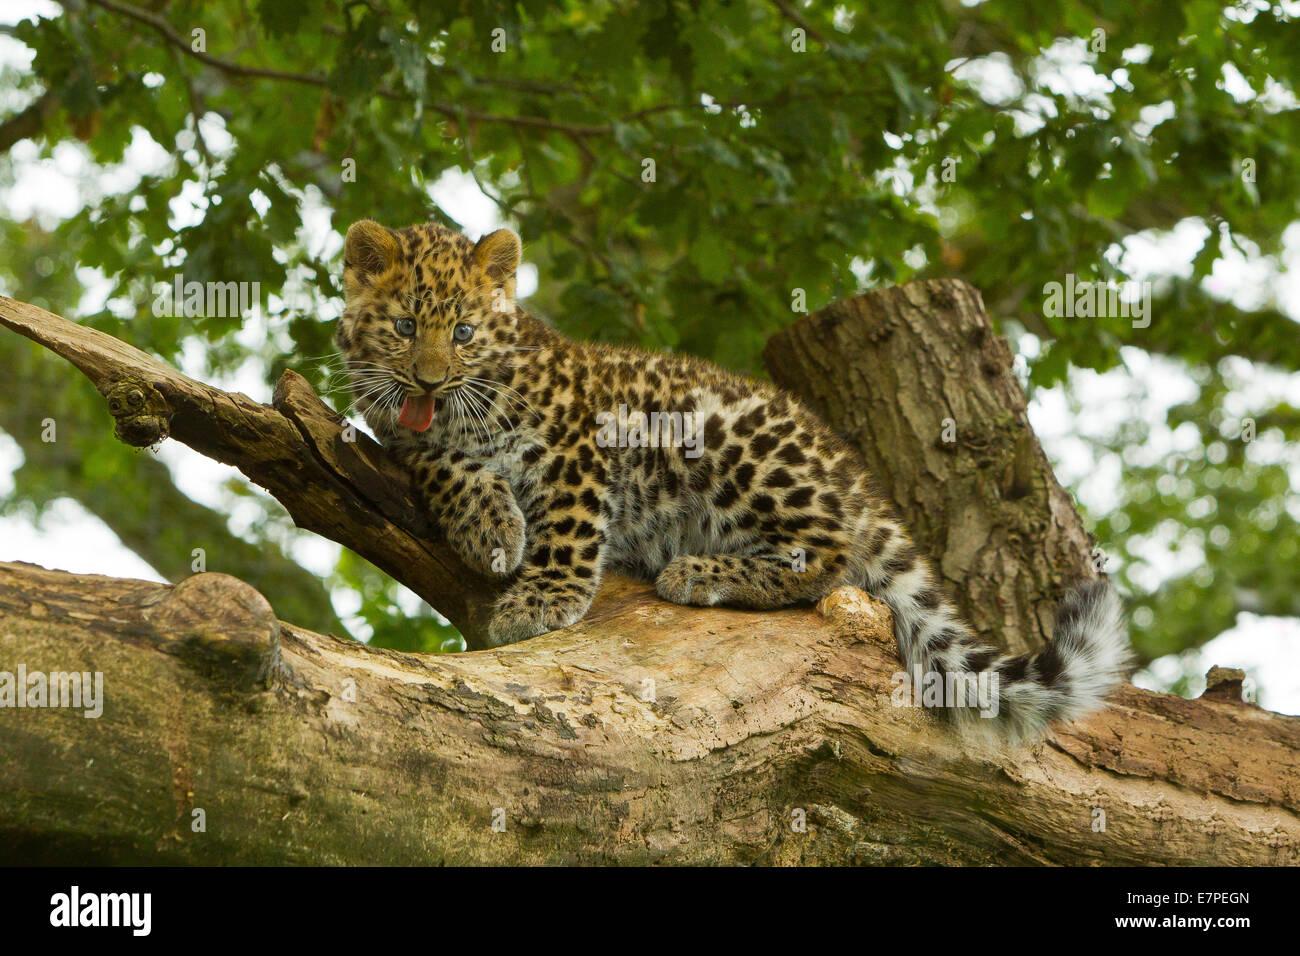 Extremely Rare Amur Leopard Cub (Panthera Pardus Orientalis) Climbing On Tree - Stock Image